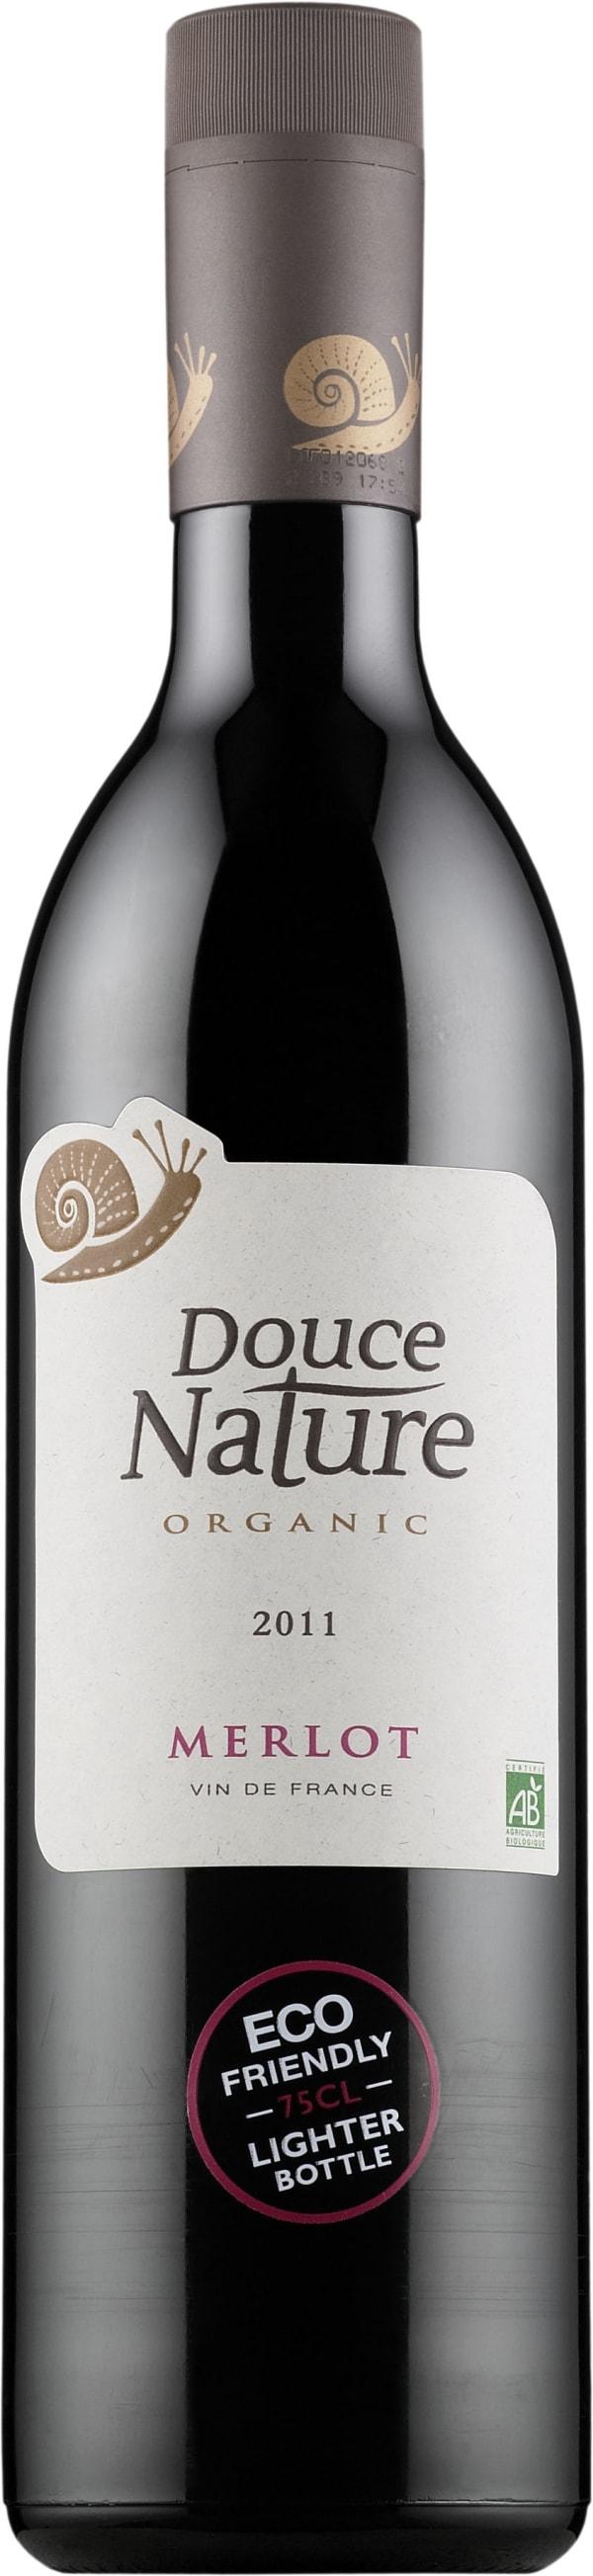 Douce Nature Organic Merlot 2015 plastflaska